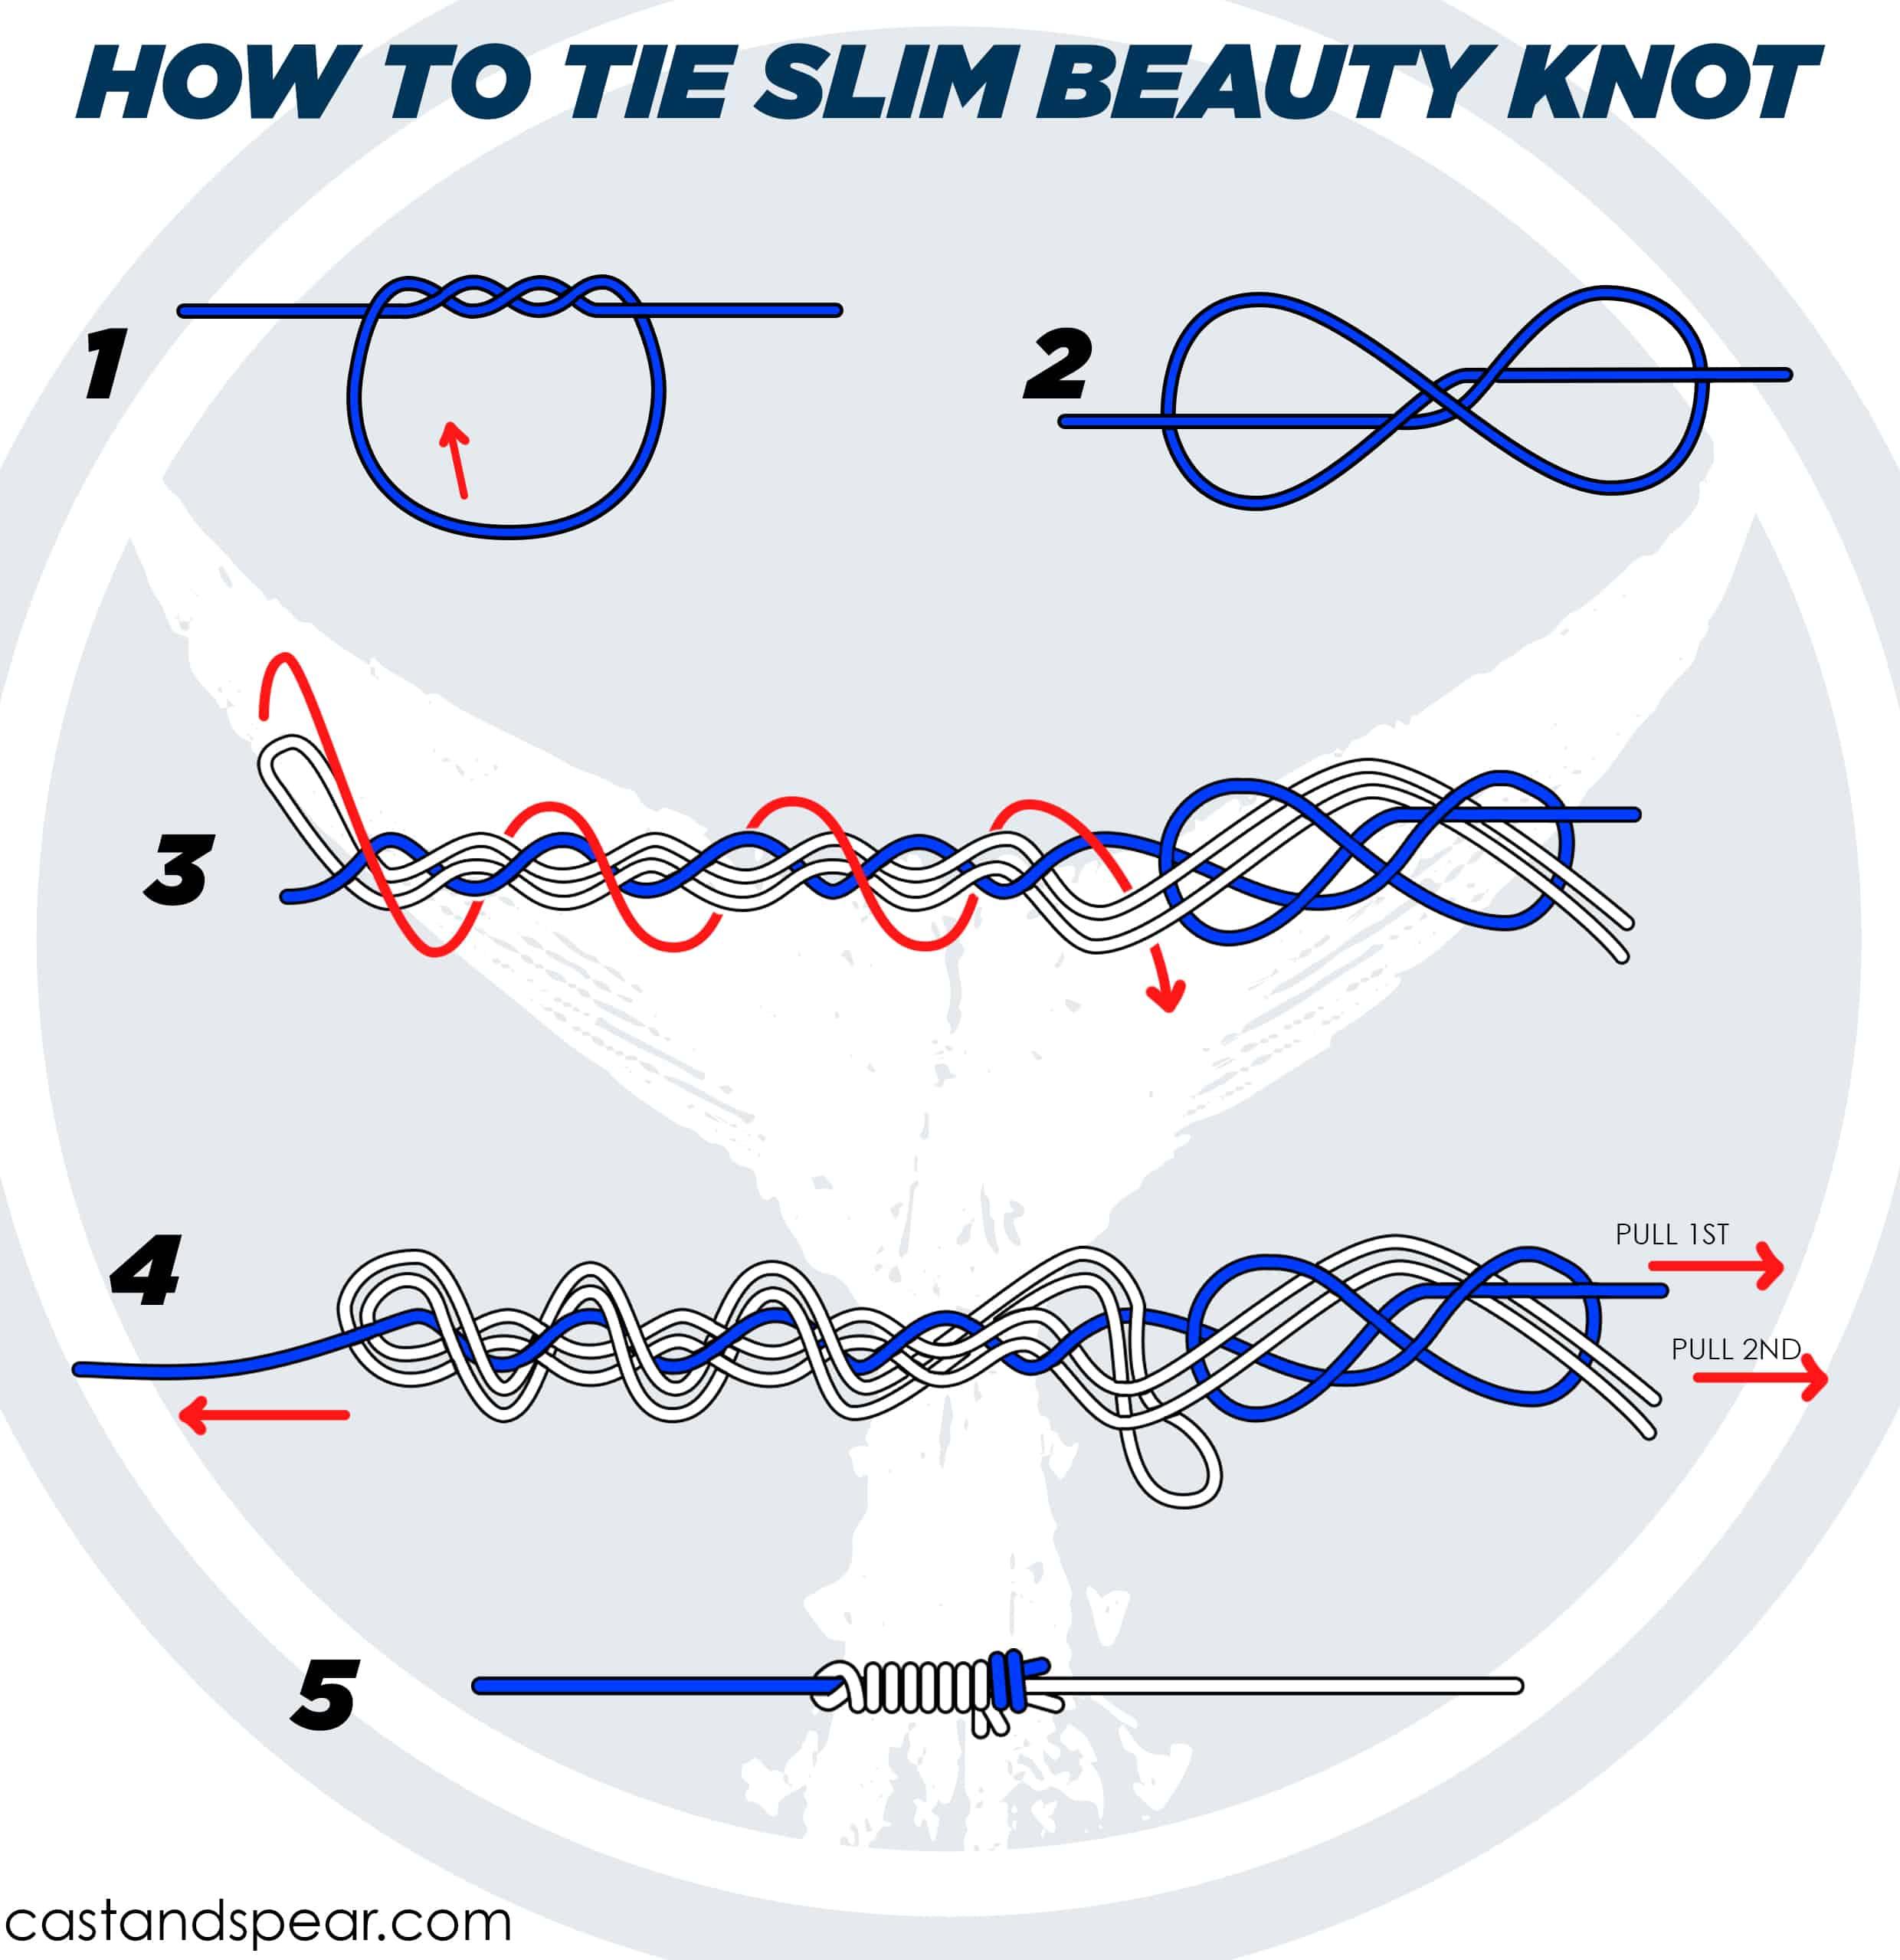 Slim Beauty